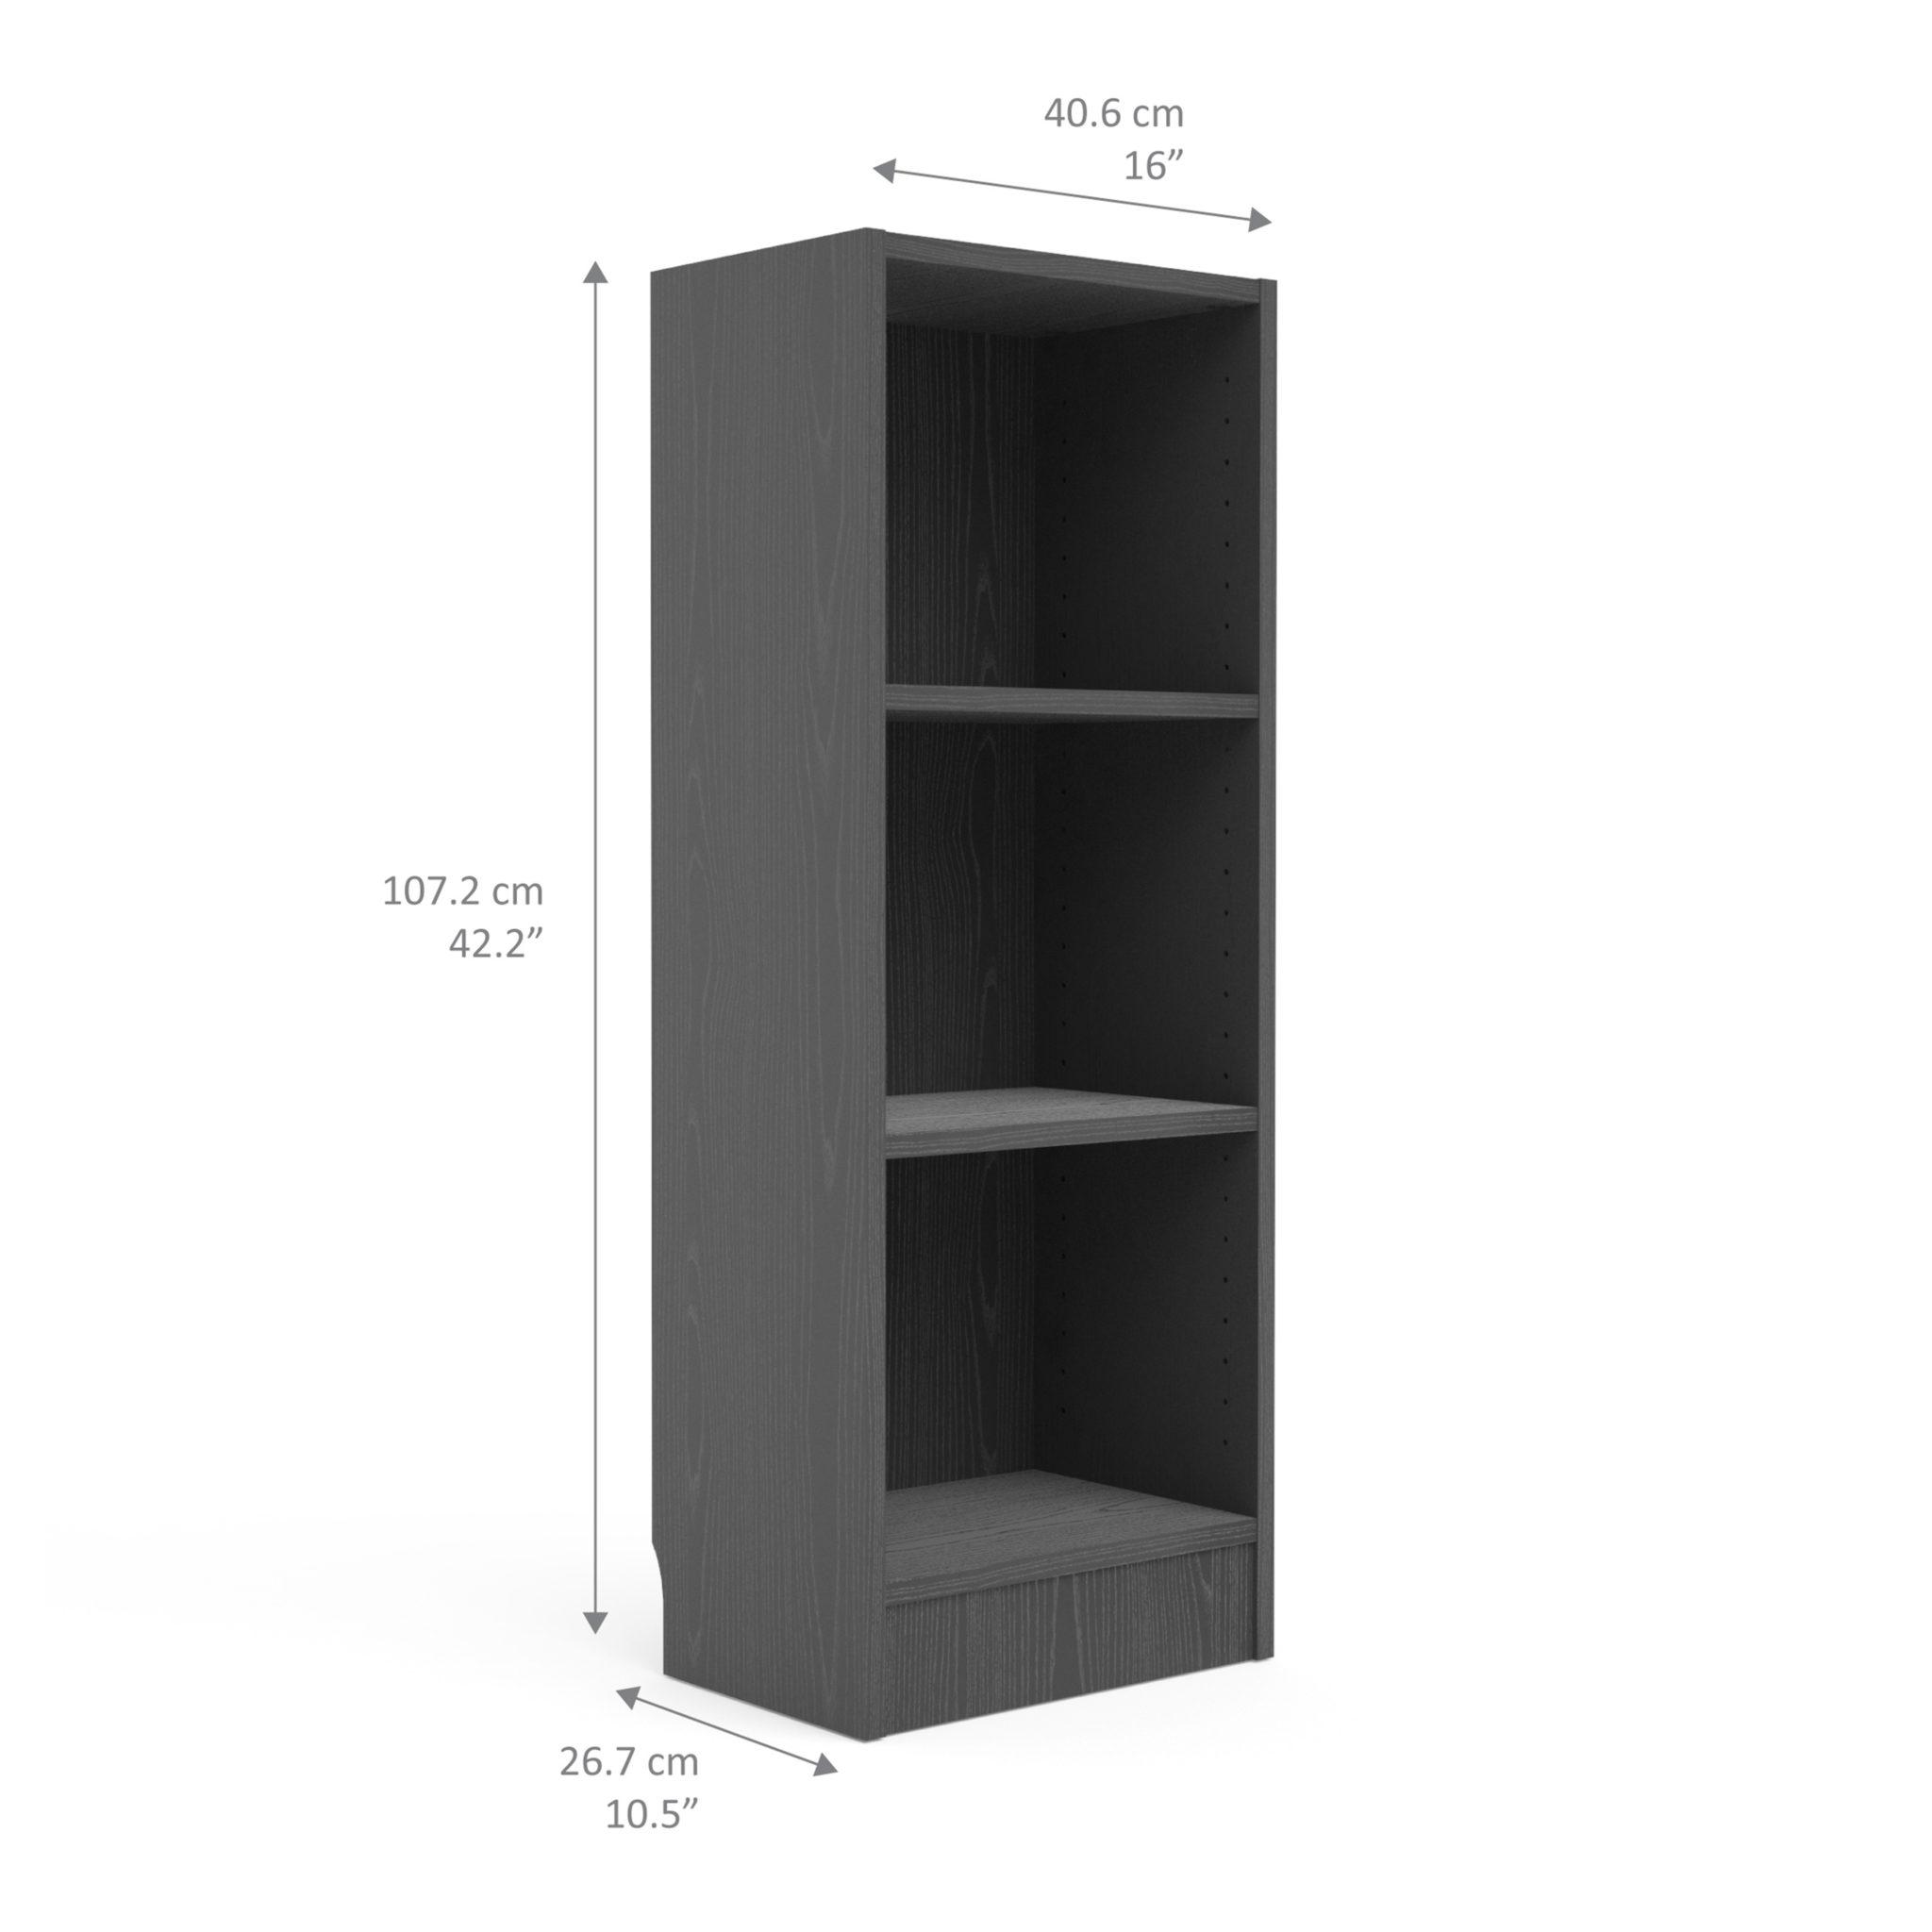 Duday Low Narrow Bookcase (2 Shelves) in Black Woodgrain